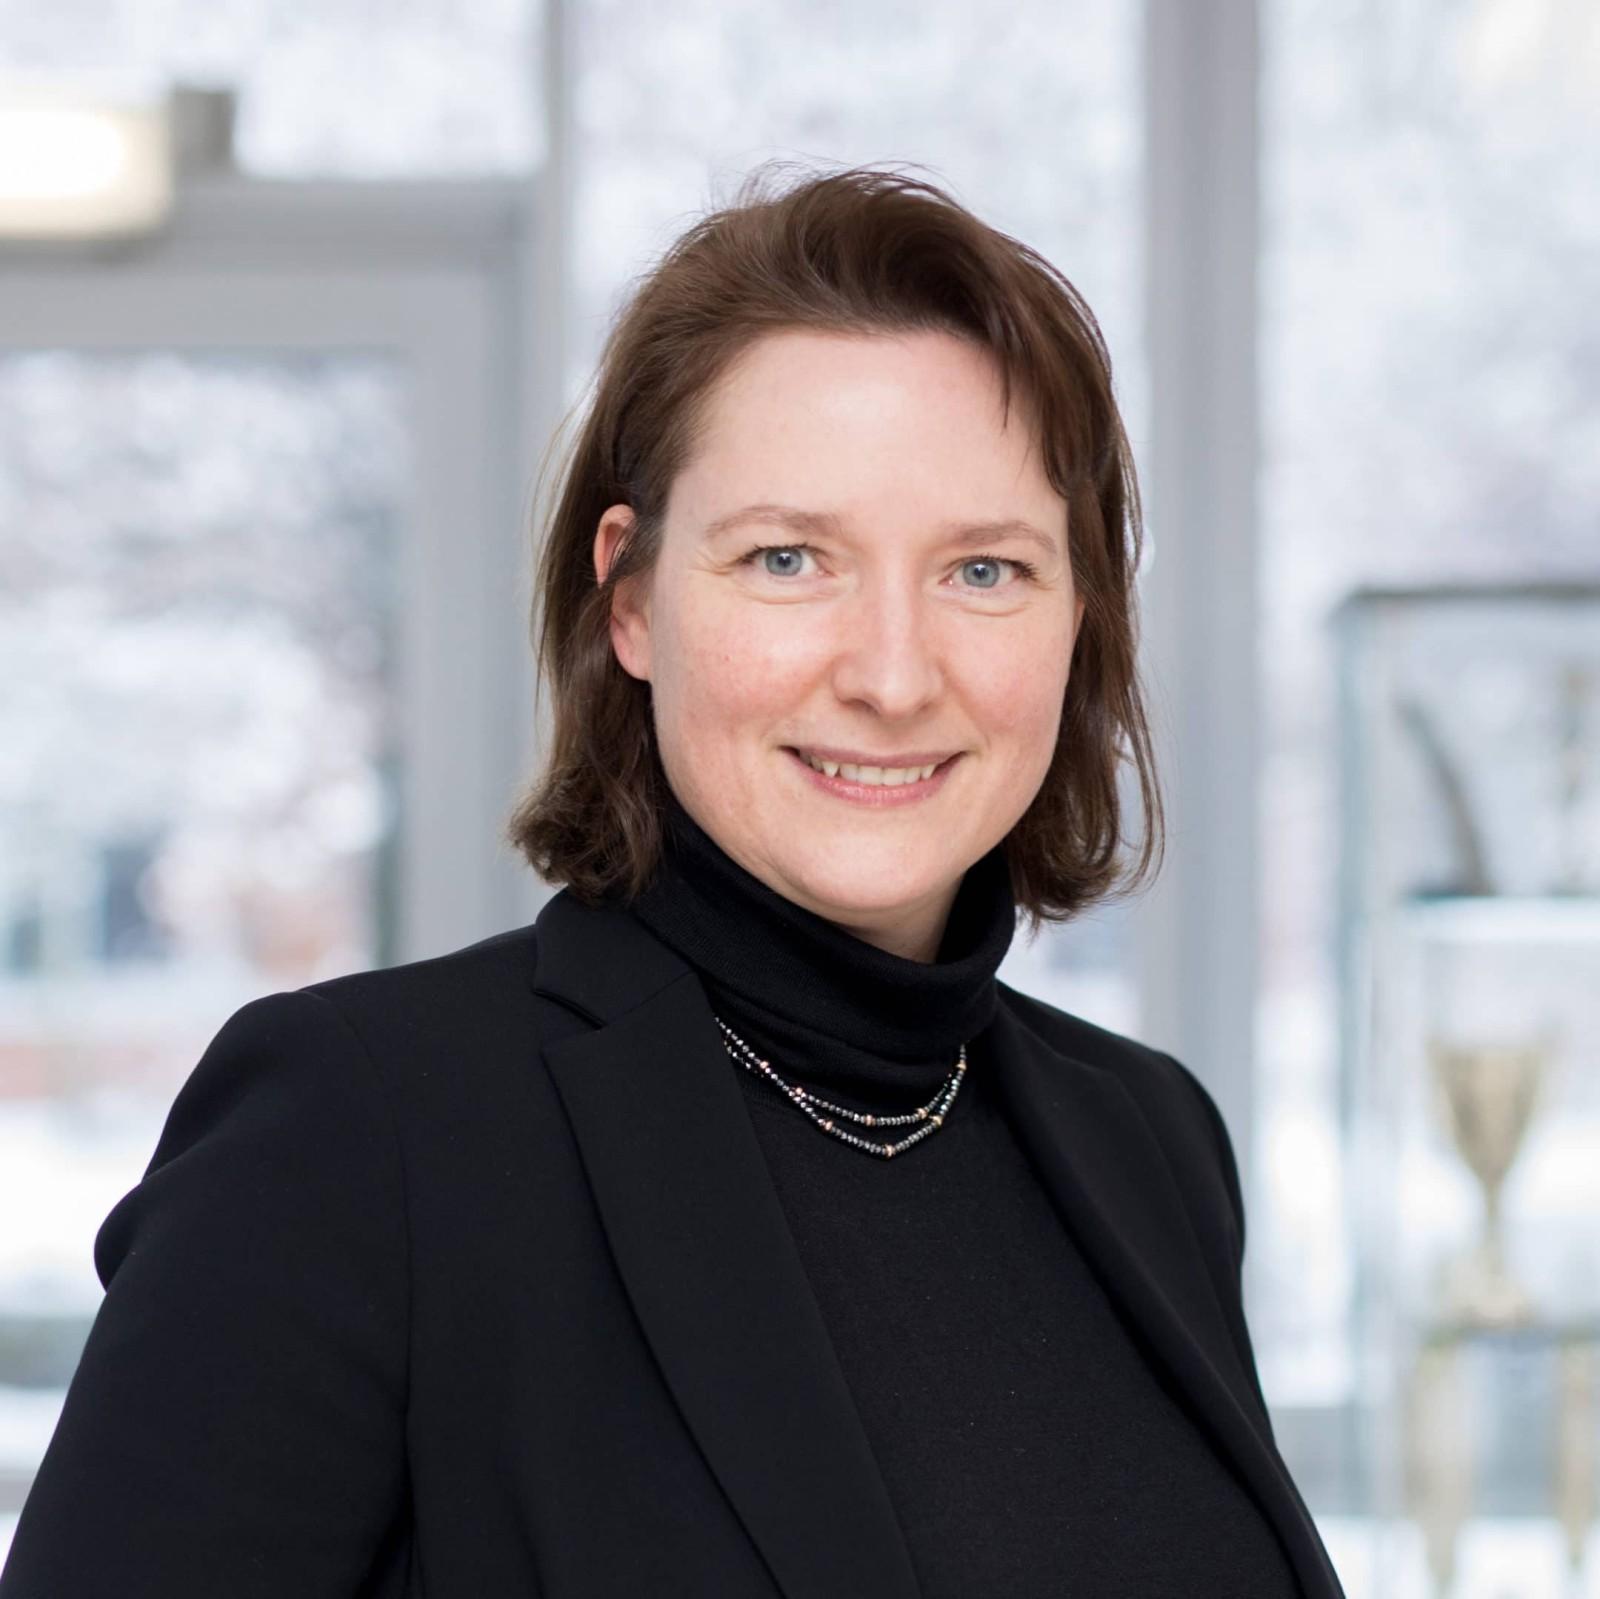 Mirja Steinkamp